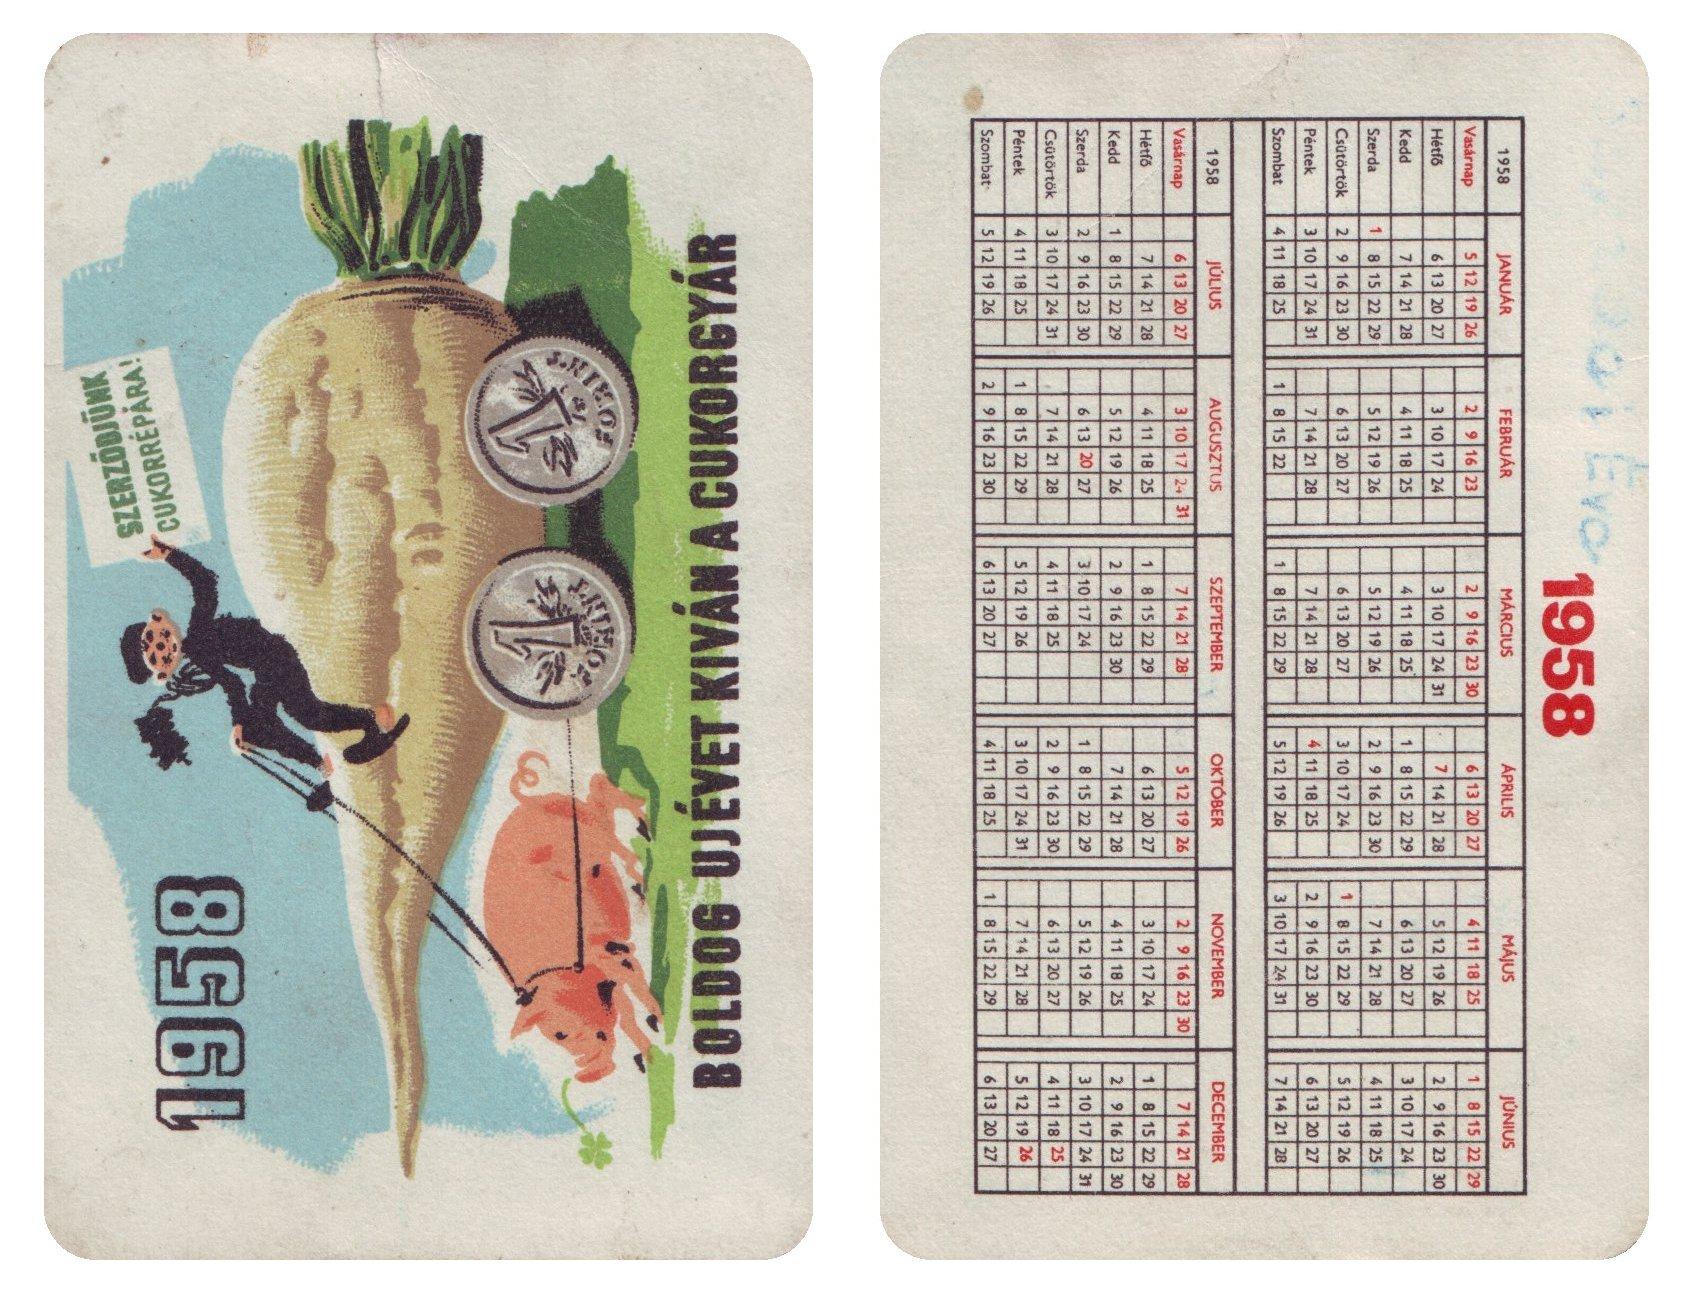 http://www.forintportal.hu/kartyanaptar/www_forintportal_hu_1958_kartyanaptar_024_nagy.jpg